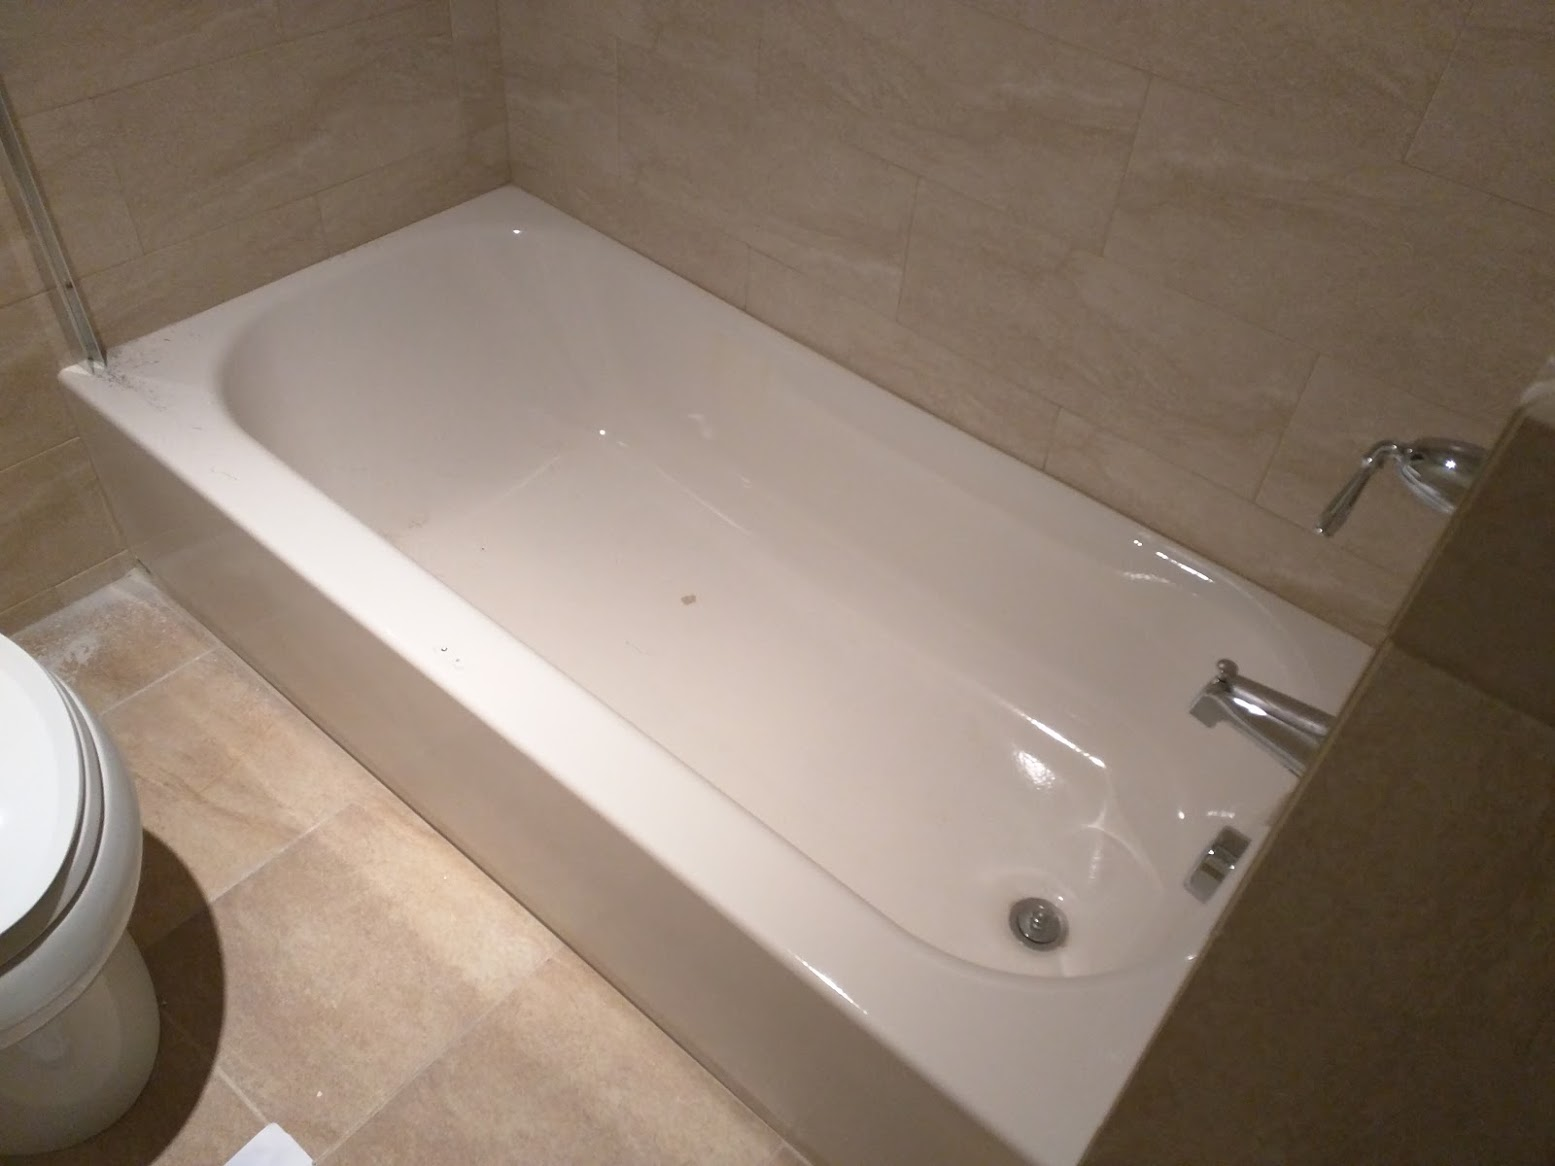 Drill Drilling Into A Bathtub Home Improvement Stack